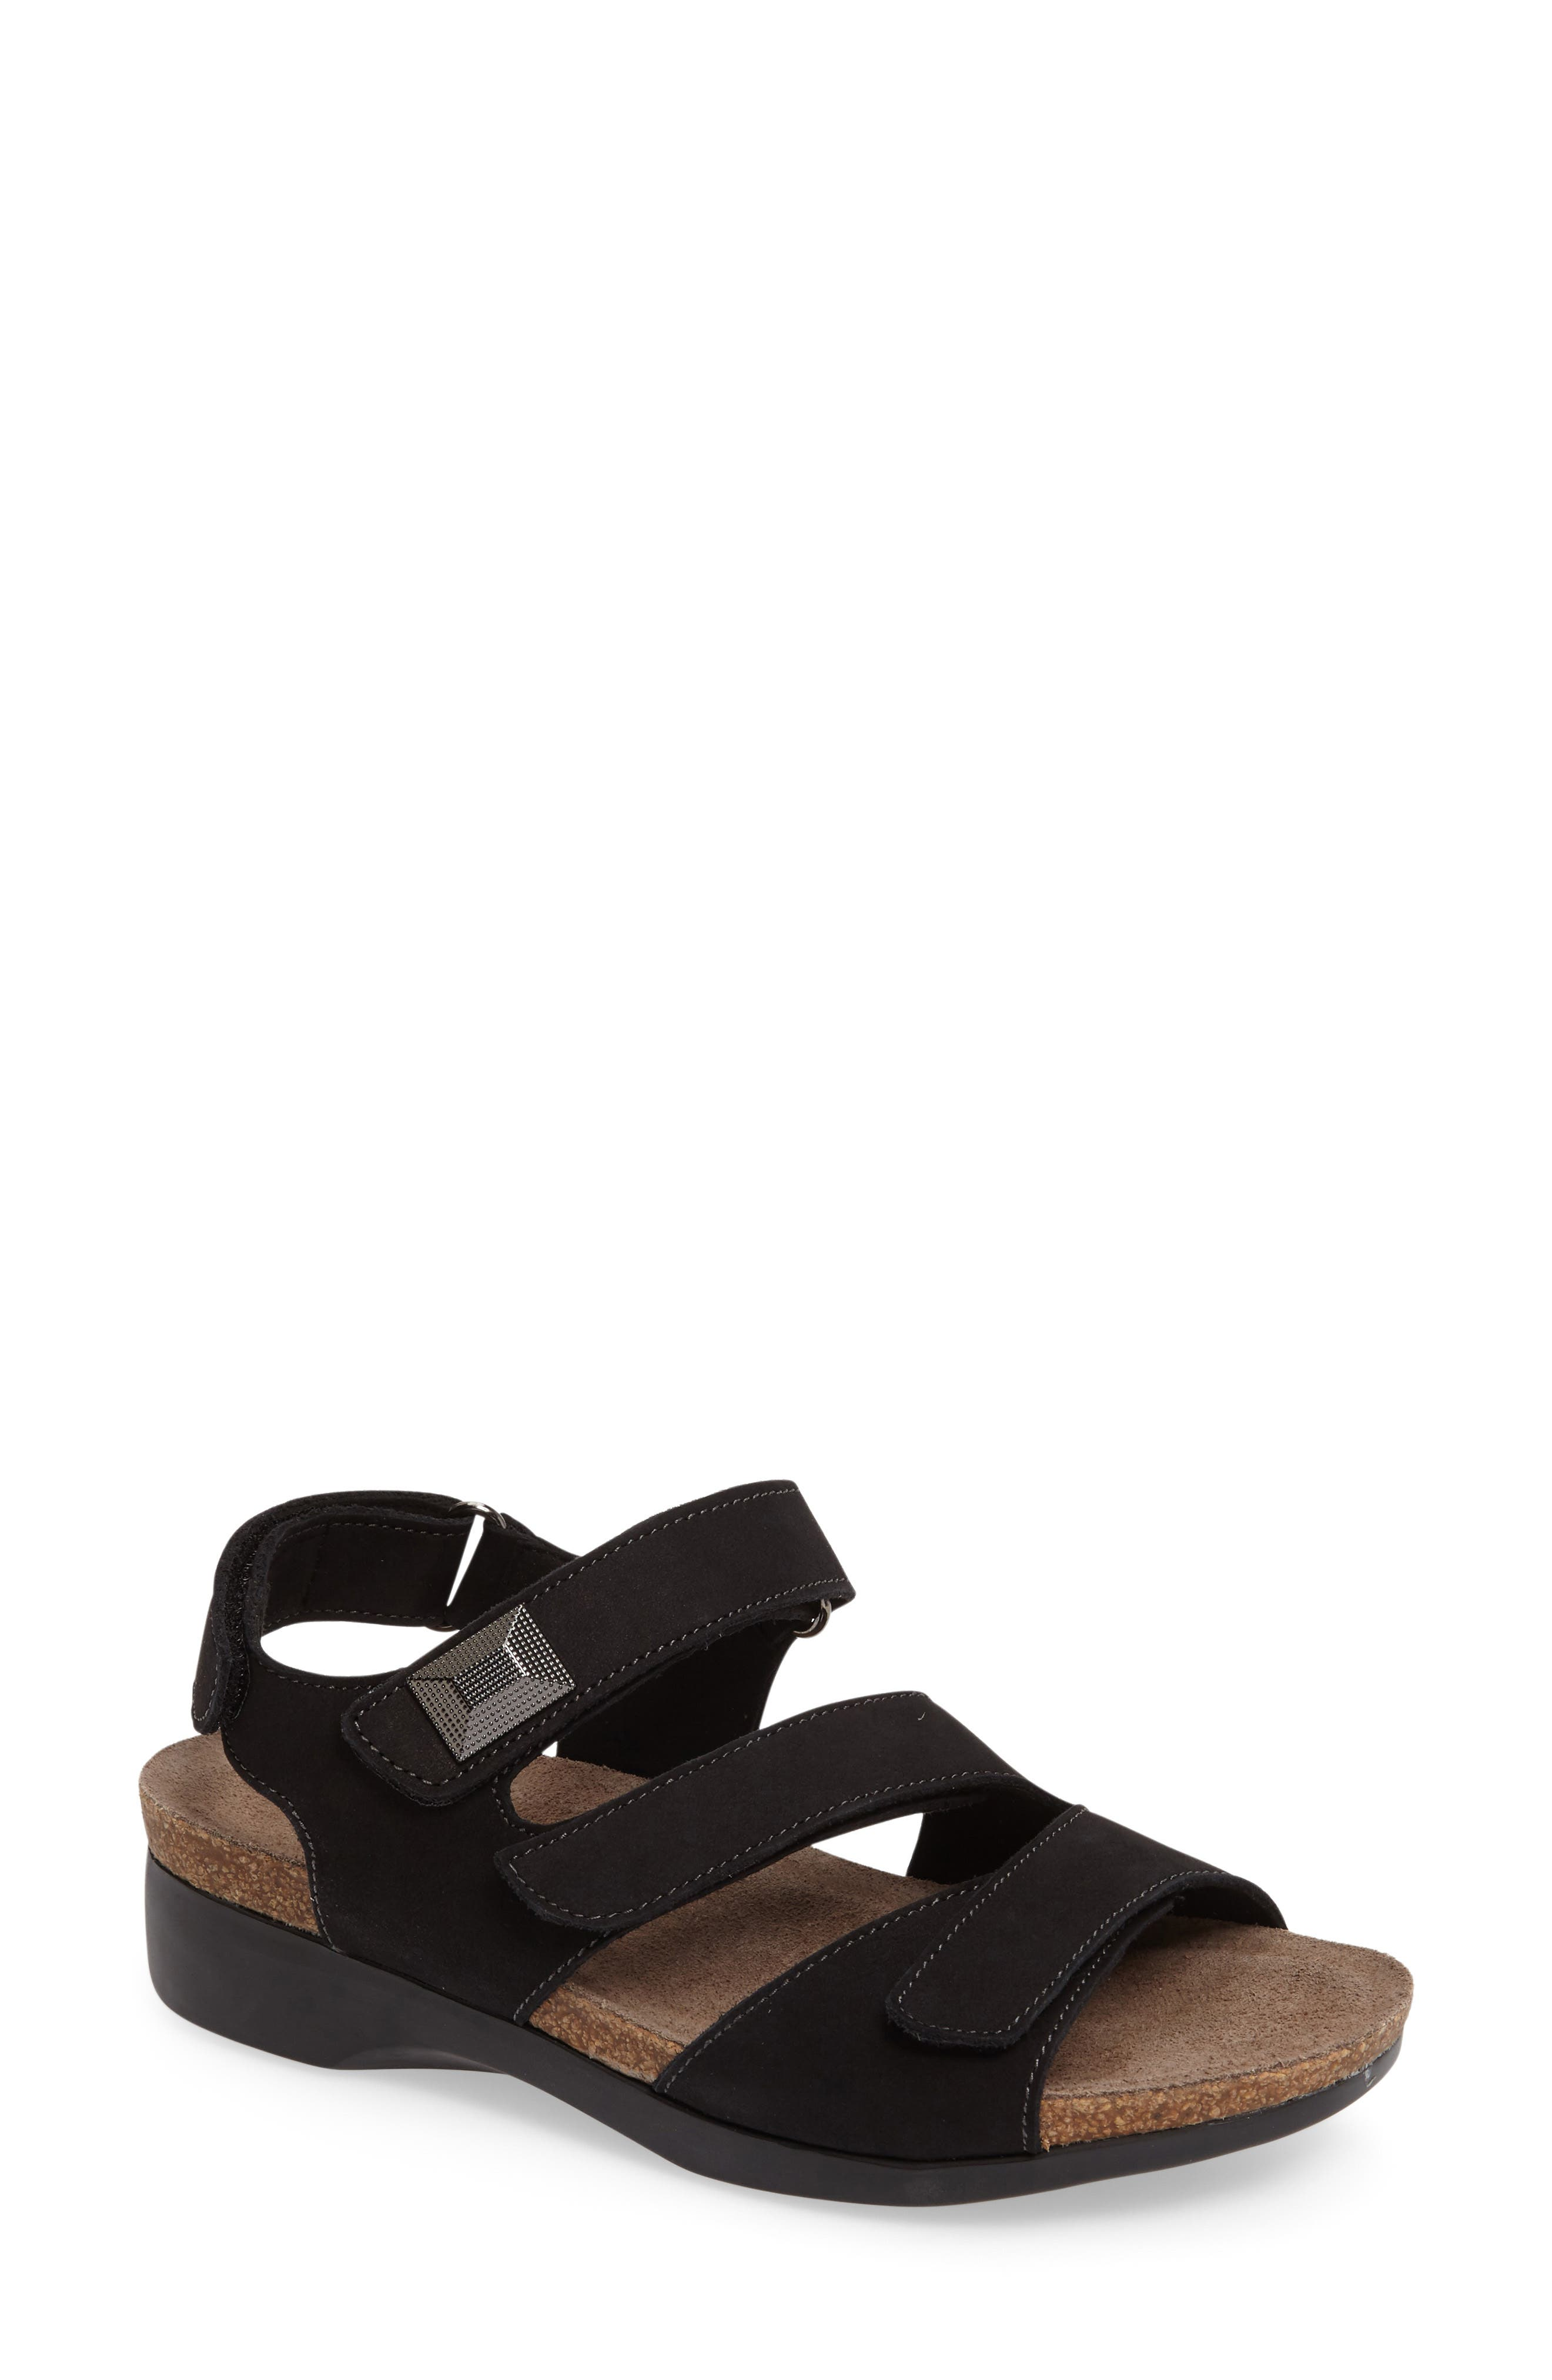 Antila Sandal,                         Main,                         color, BLACK